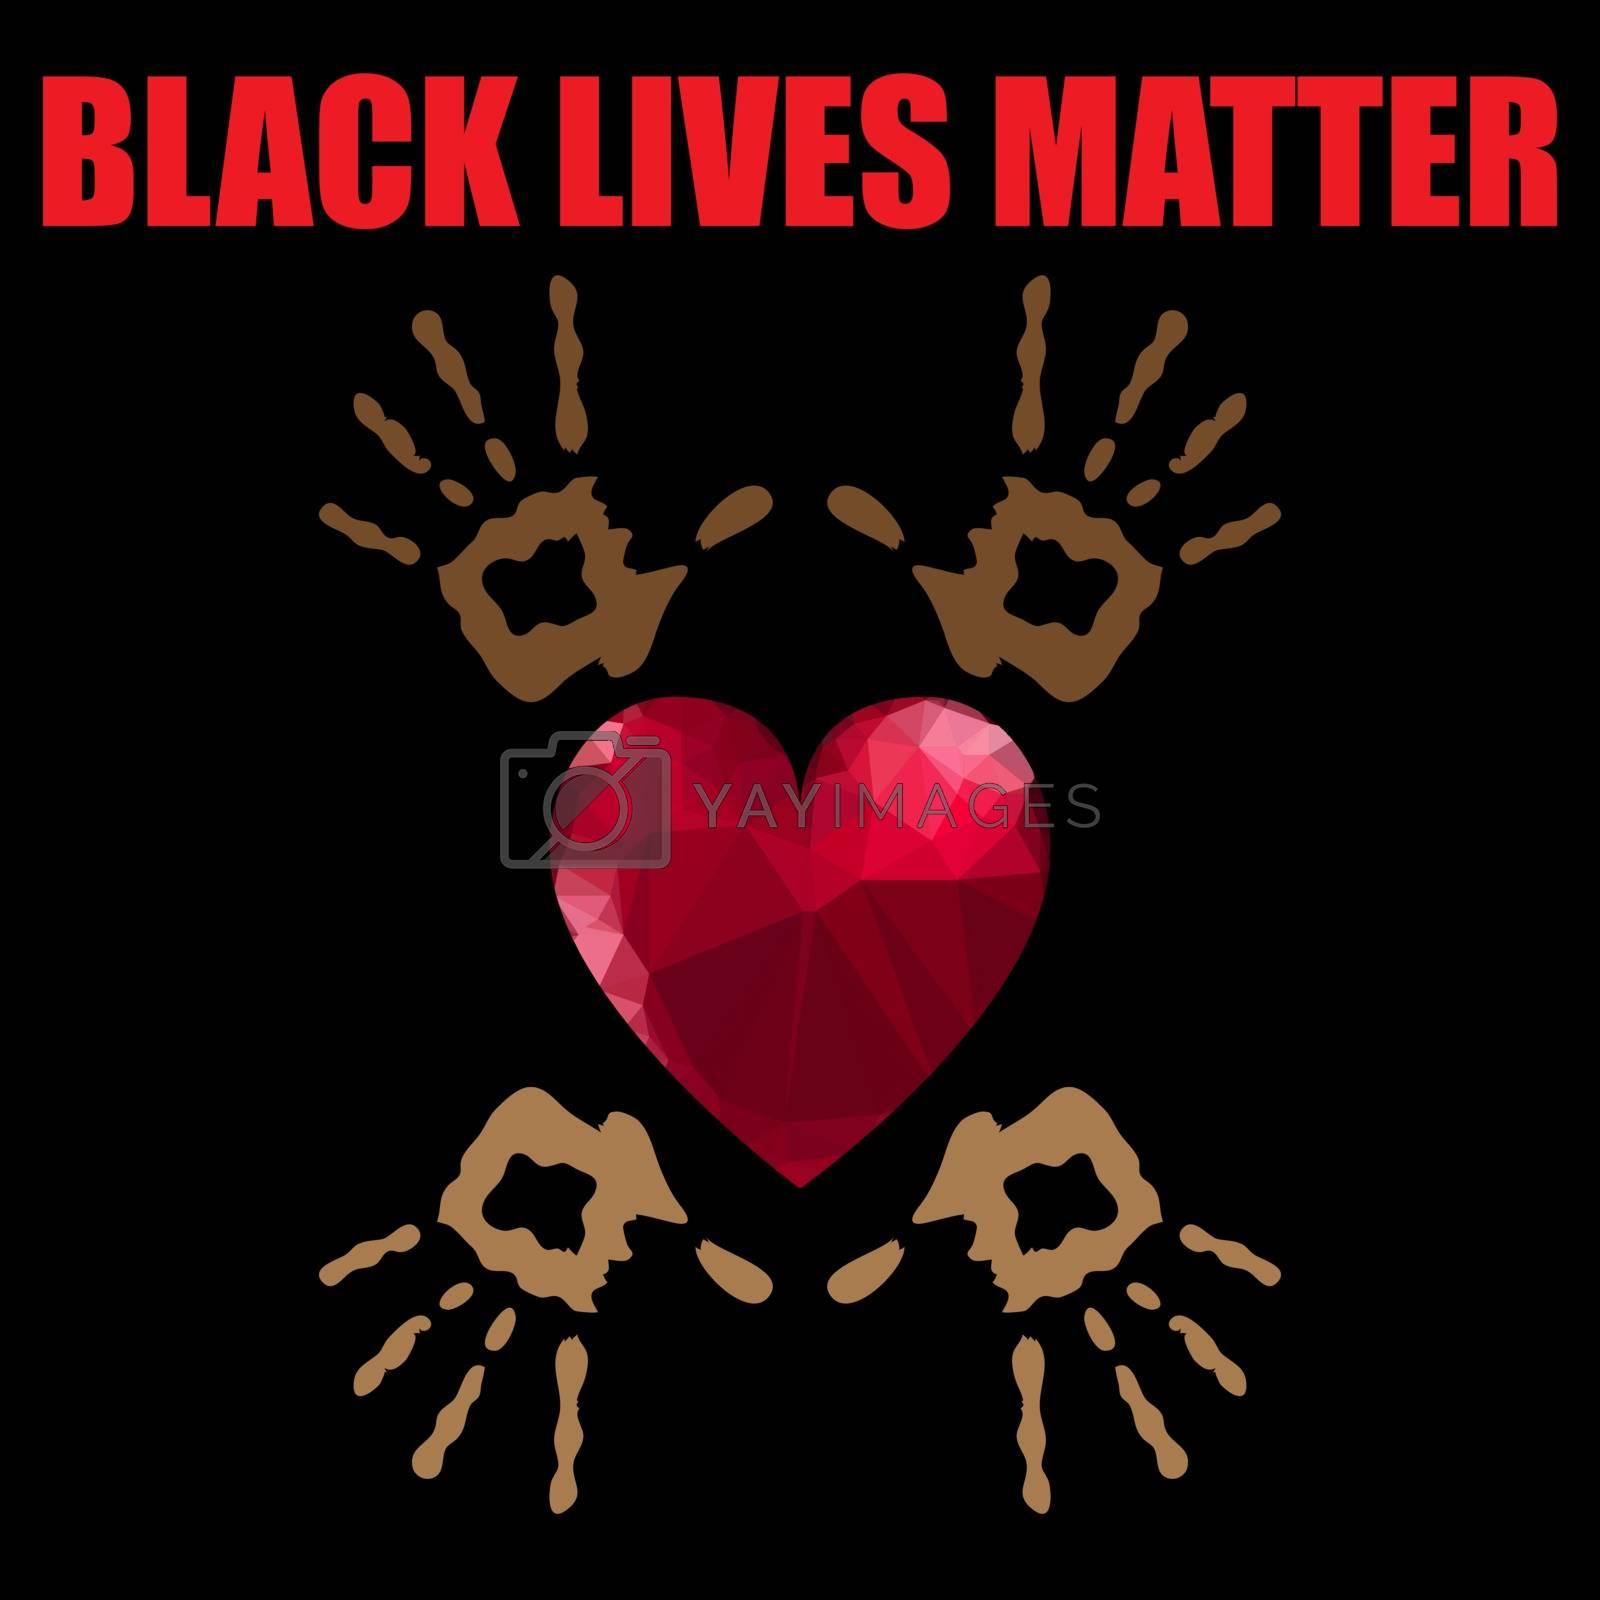 Black Lives Matter Banner with Red Heart for Protest on Black Background.